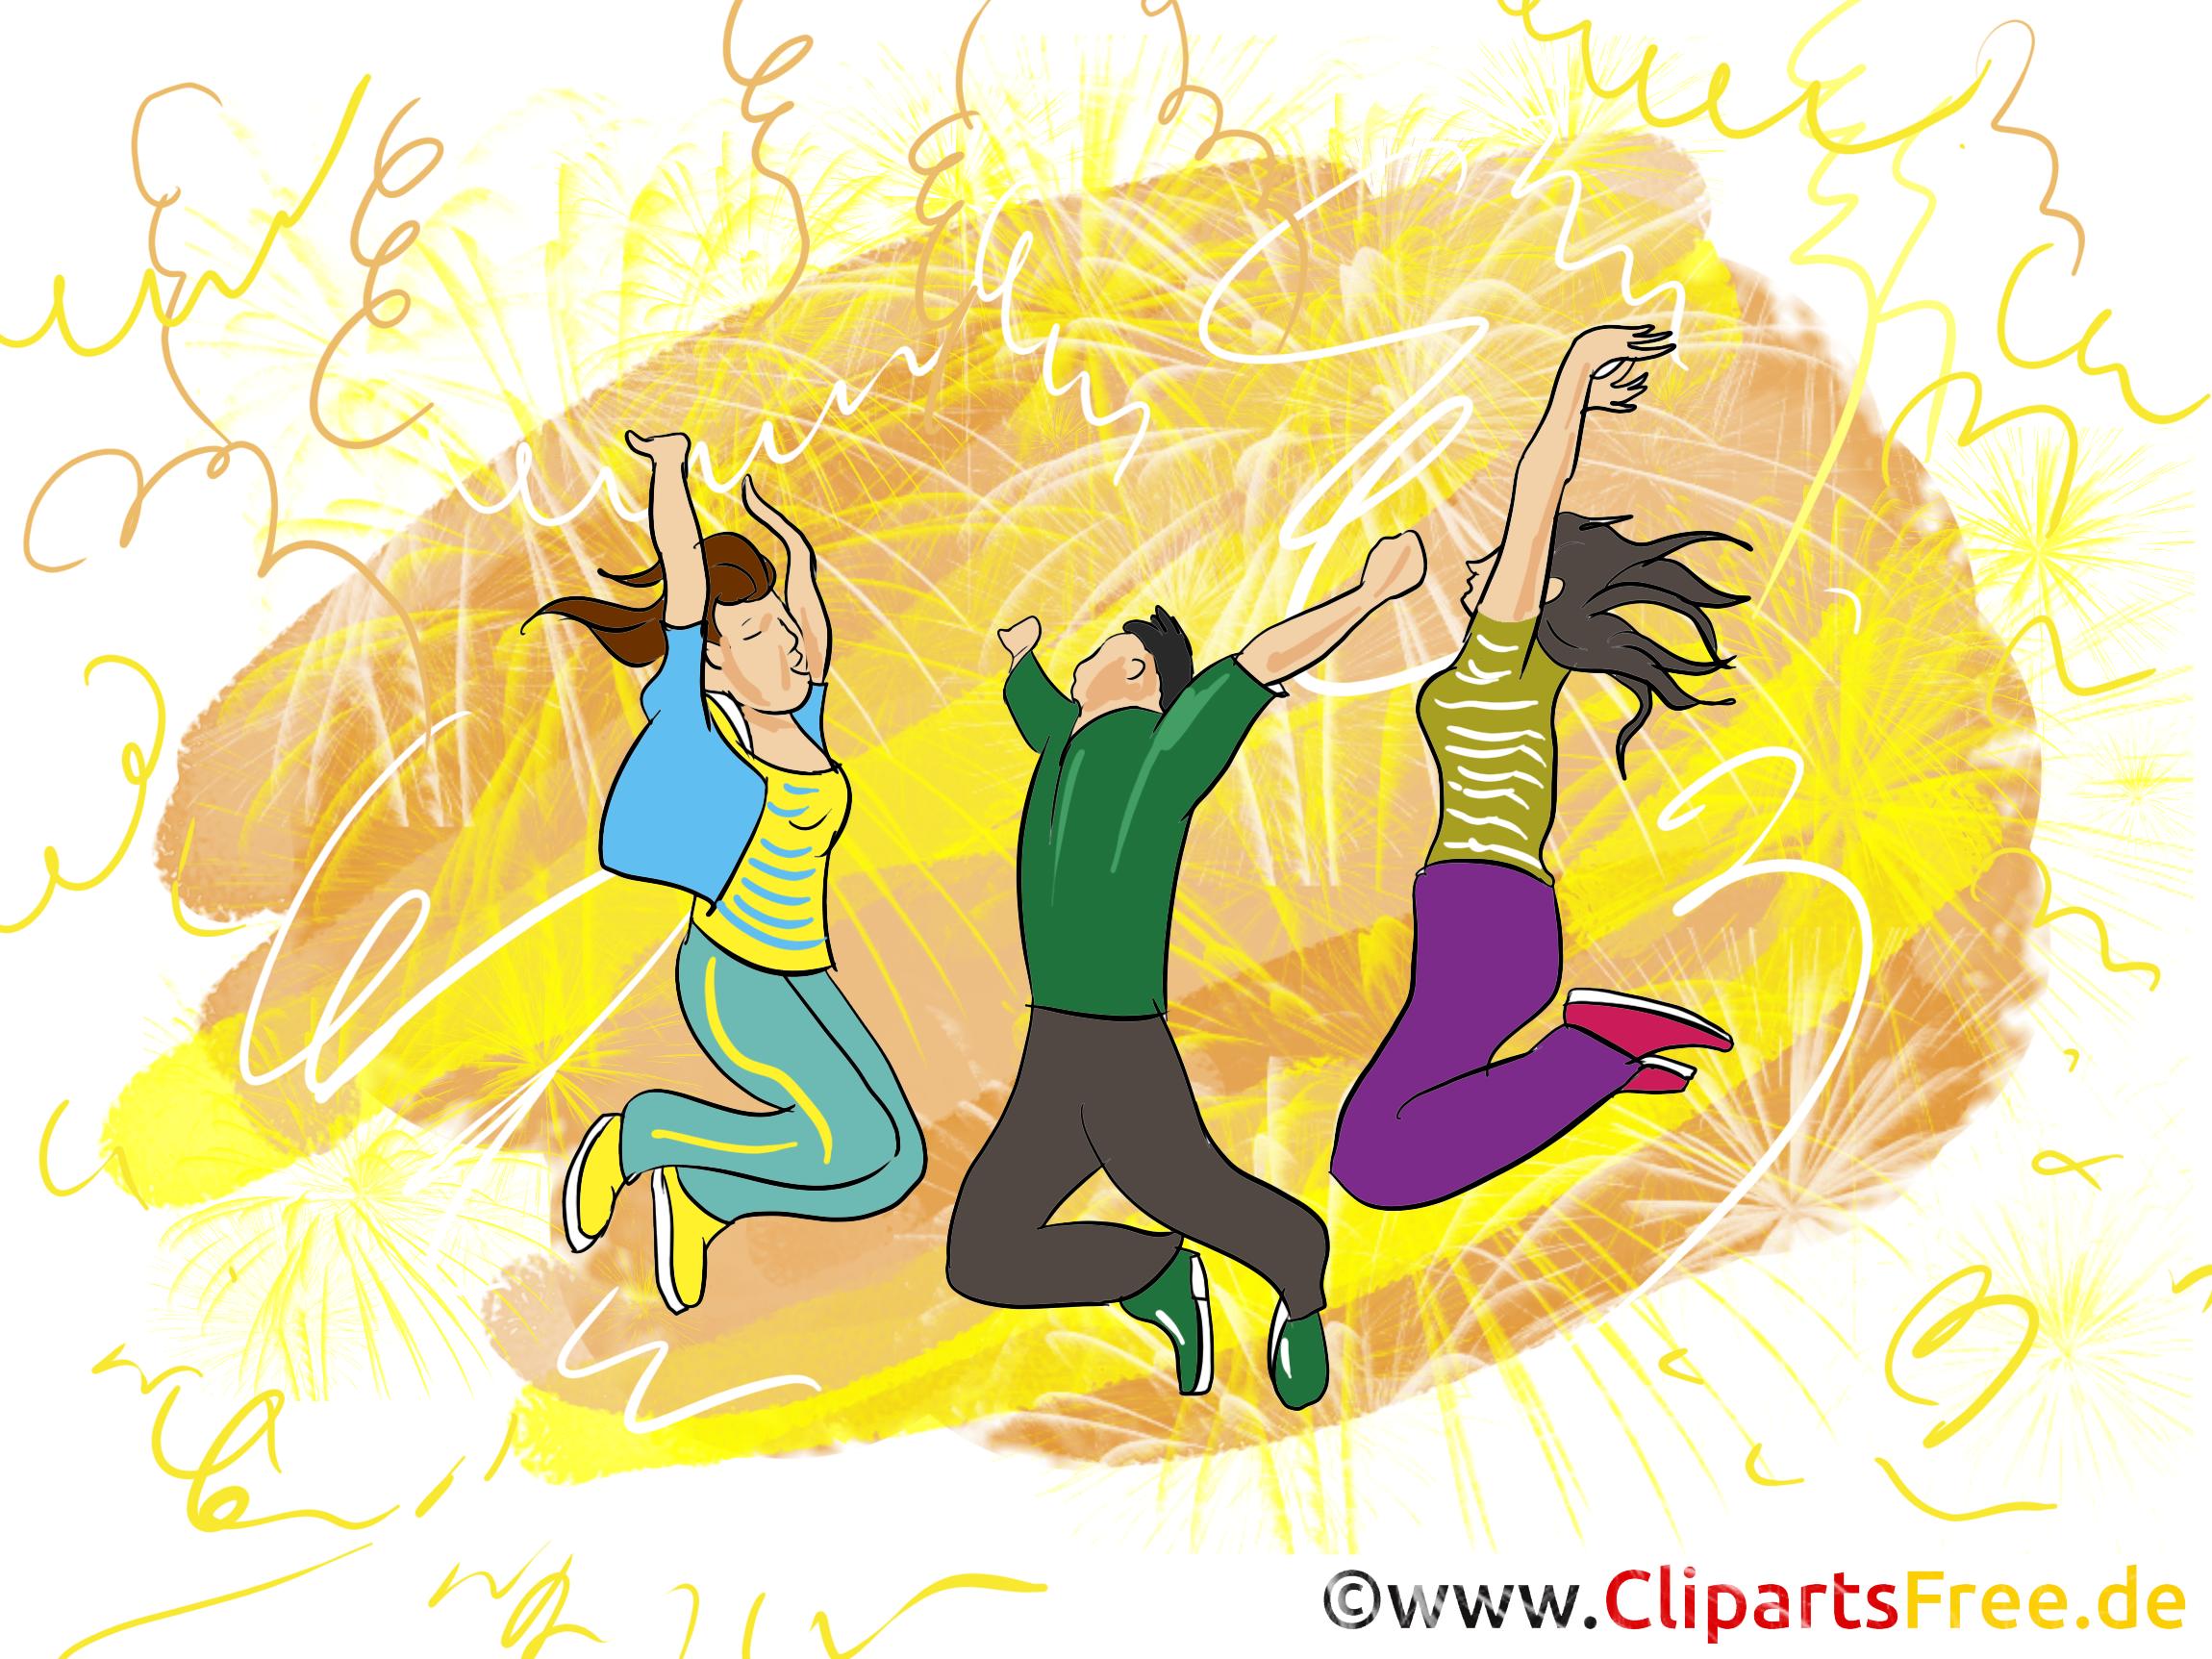 Soirée clip arts gratuits - Disco illustrations